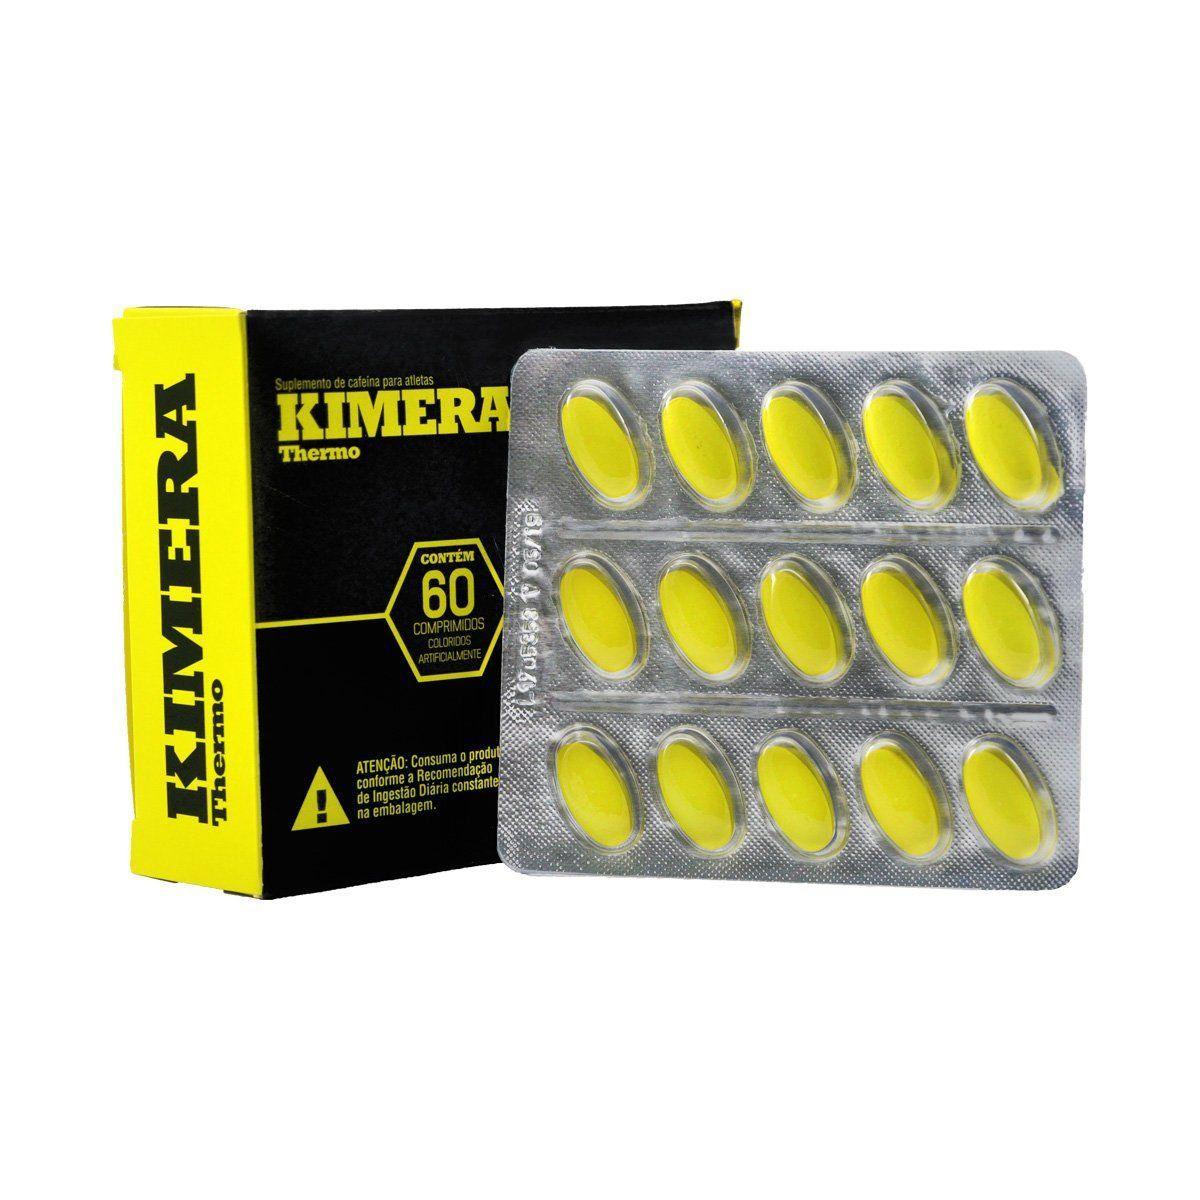 Termogênico Kimera 60 Comprimidos - Iridium Labs